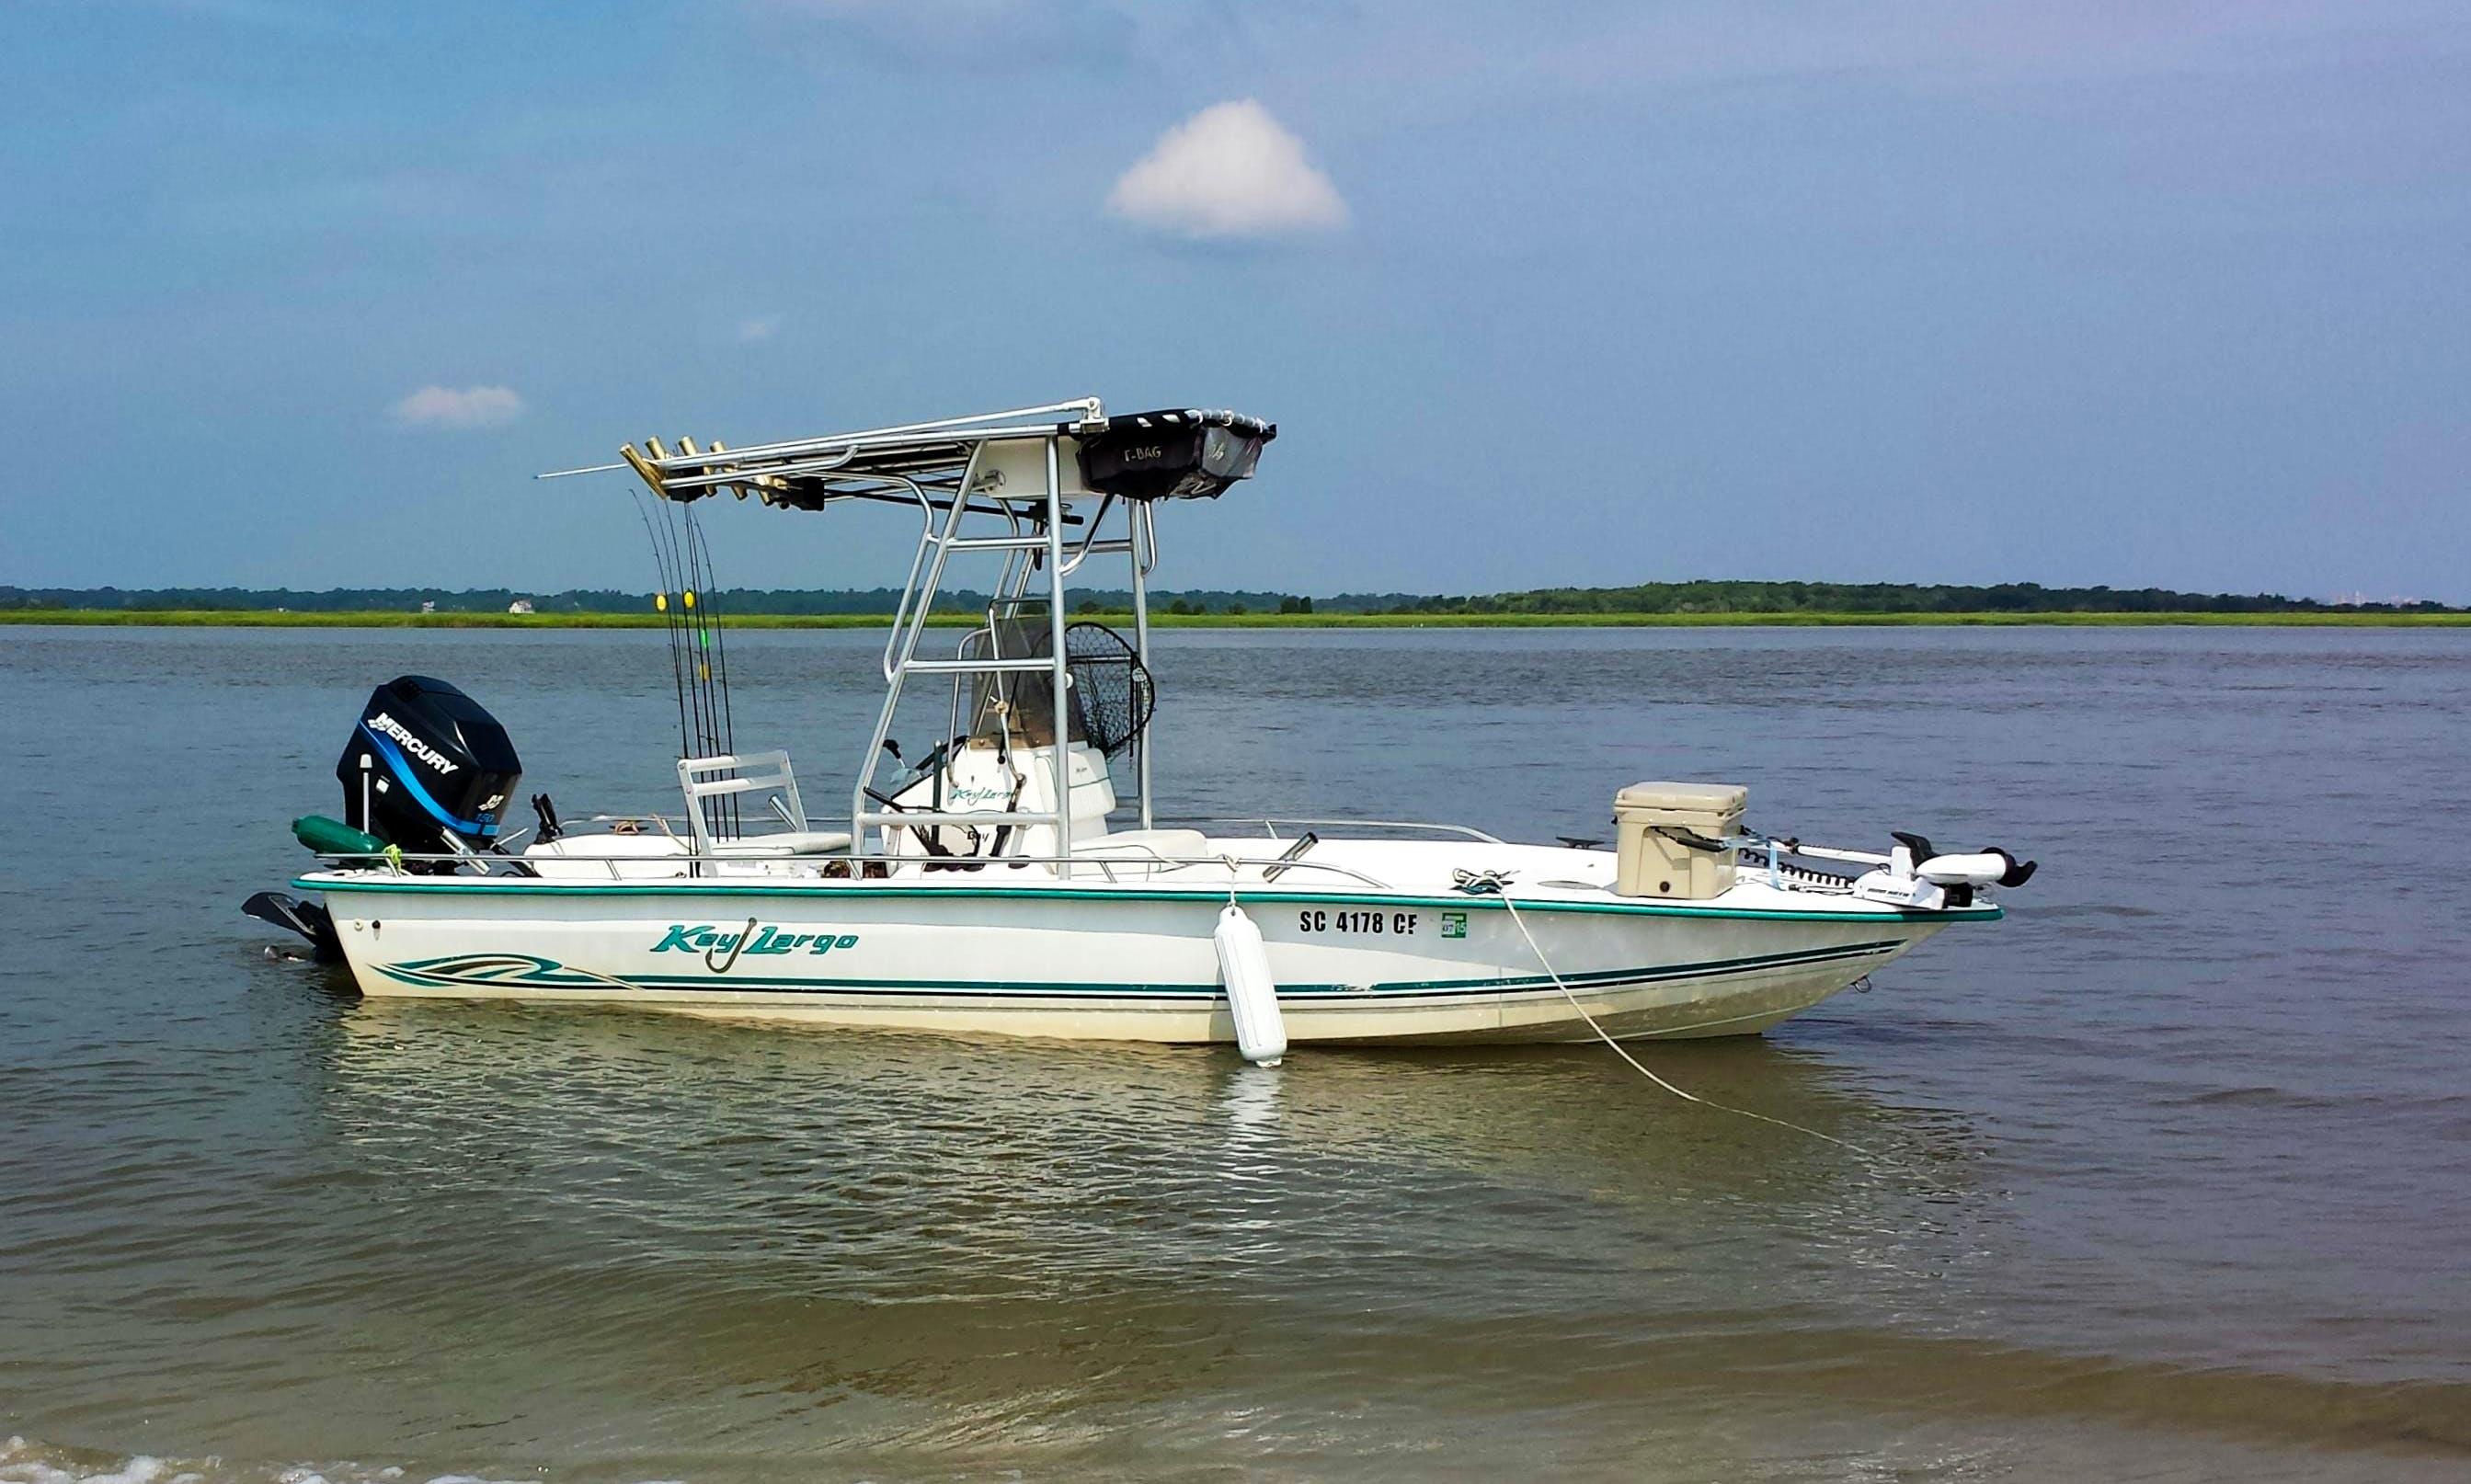 21' Key Largo Fishing Boat in Mount Pleasant, South Carolina